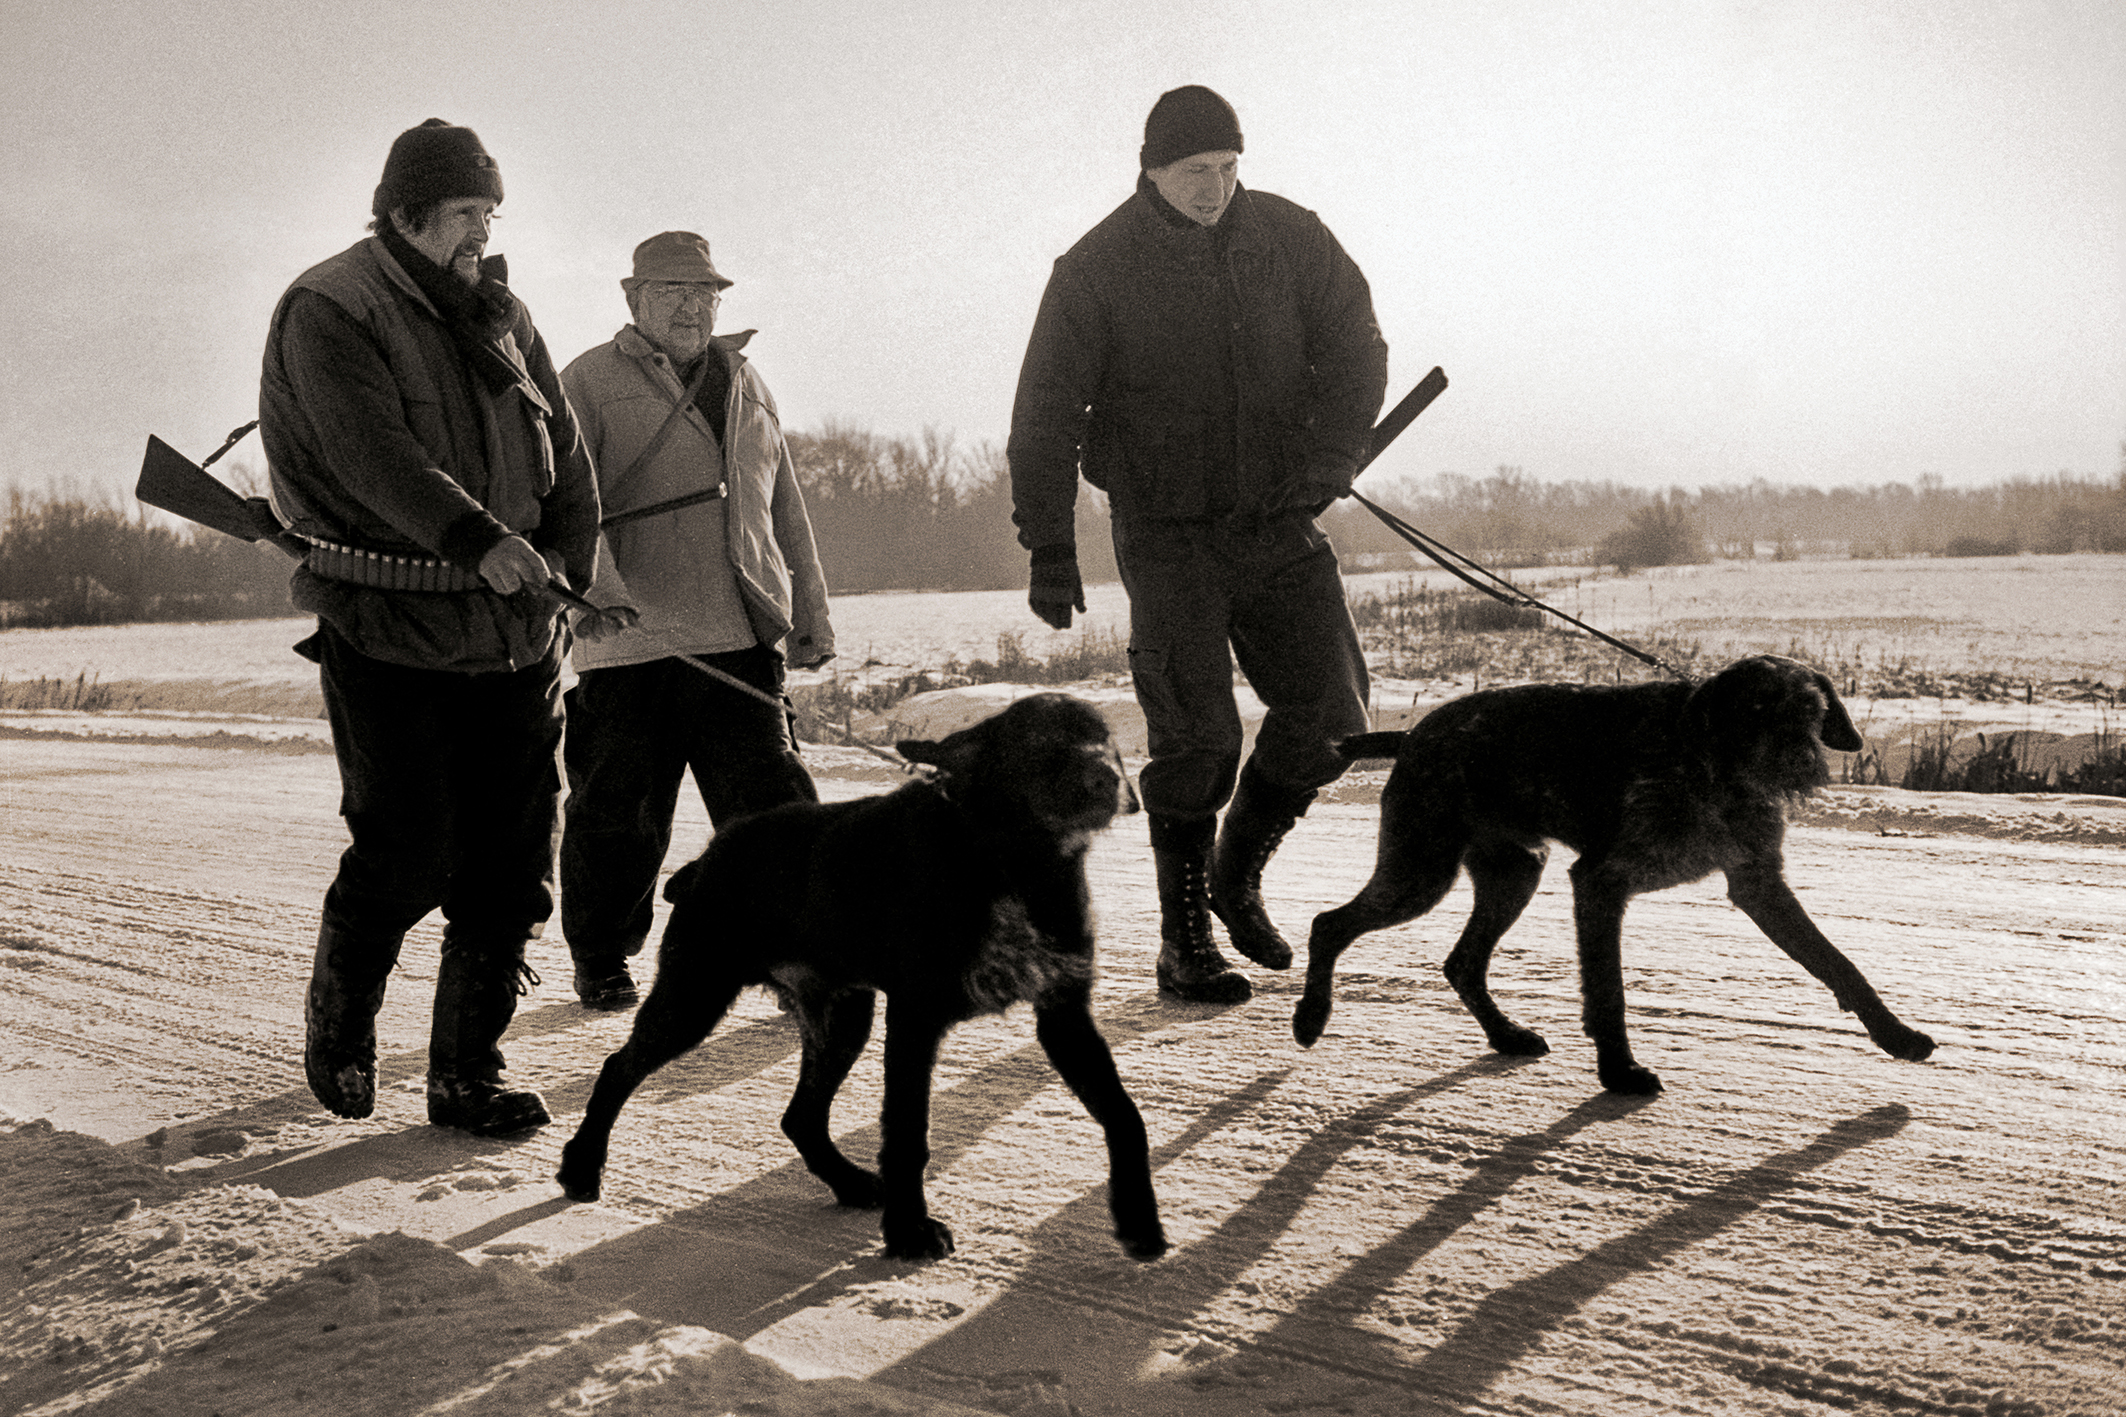 01-Sedliak_Pál-Vânatul de iarn